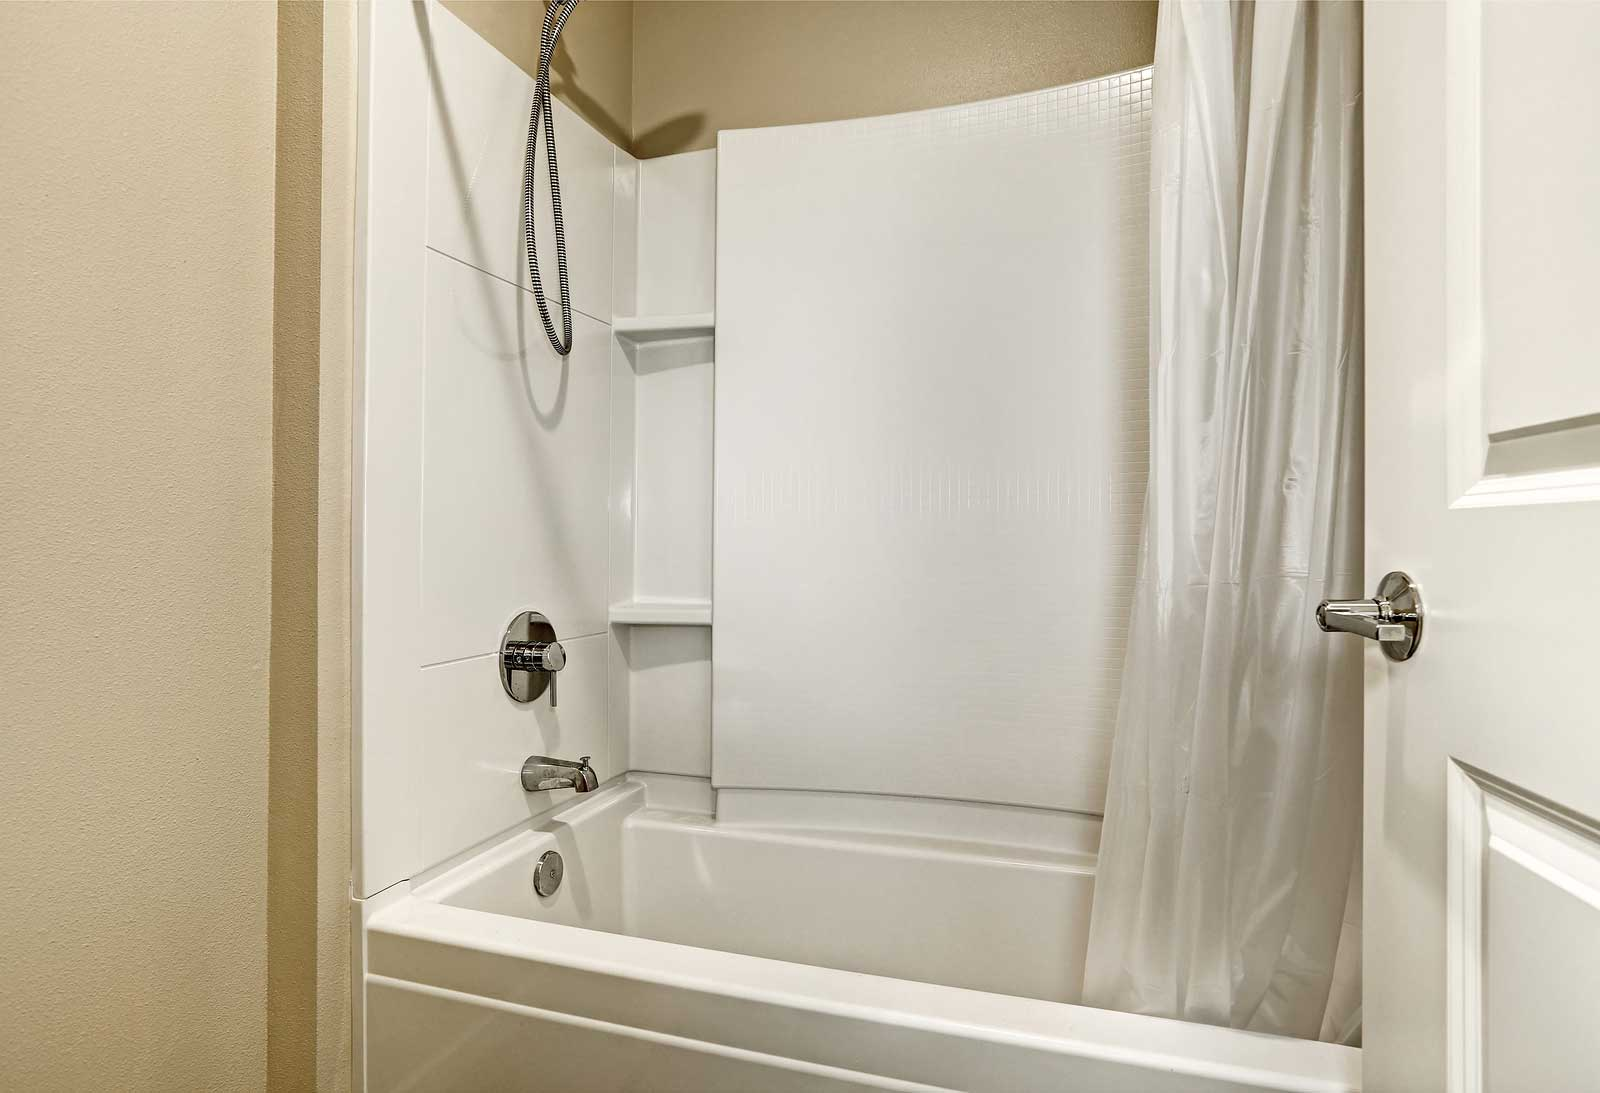 Fiberglass Bathtub Amp Shower Repair Experts In St Charles IL